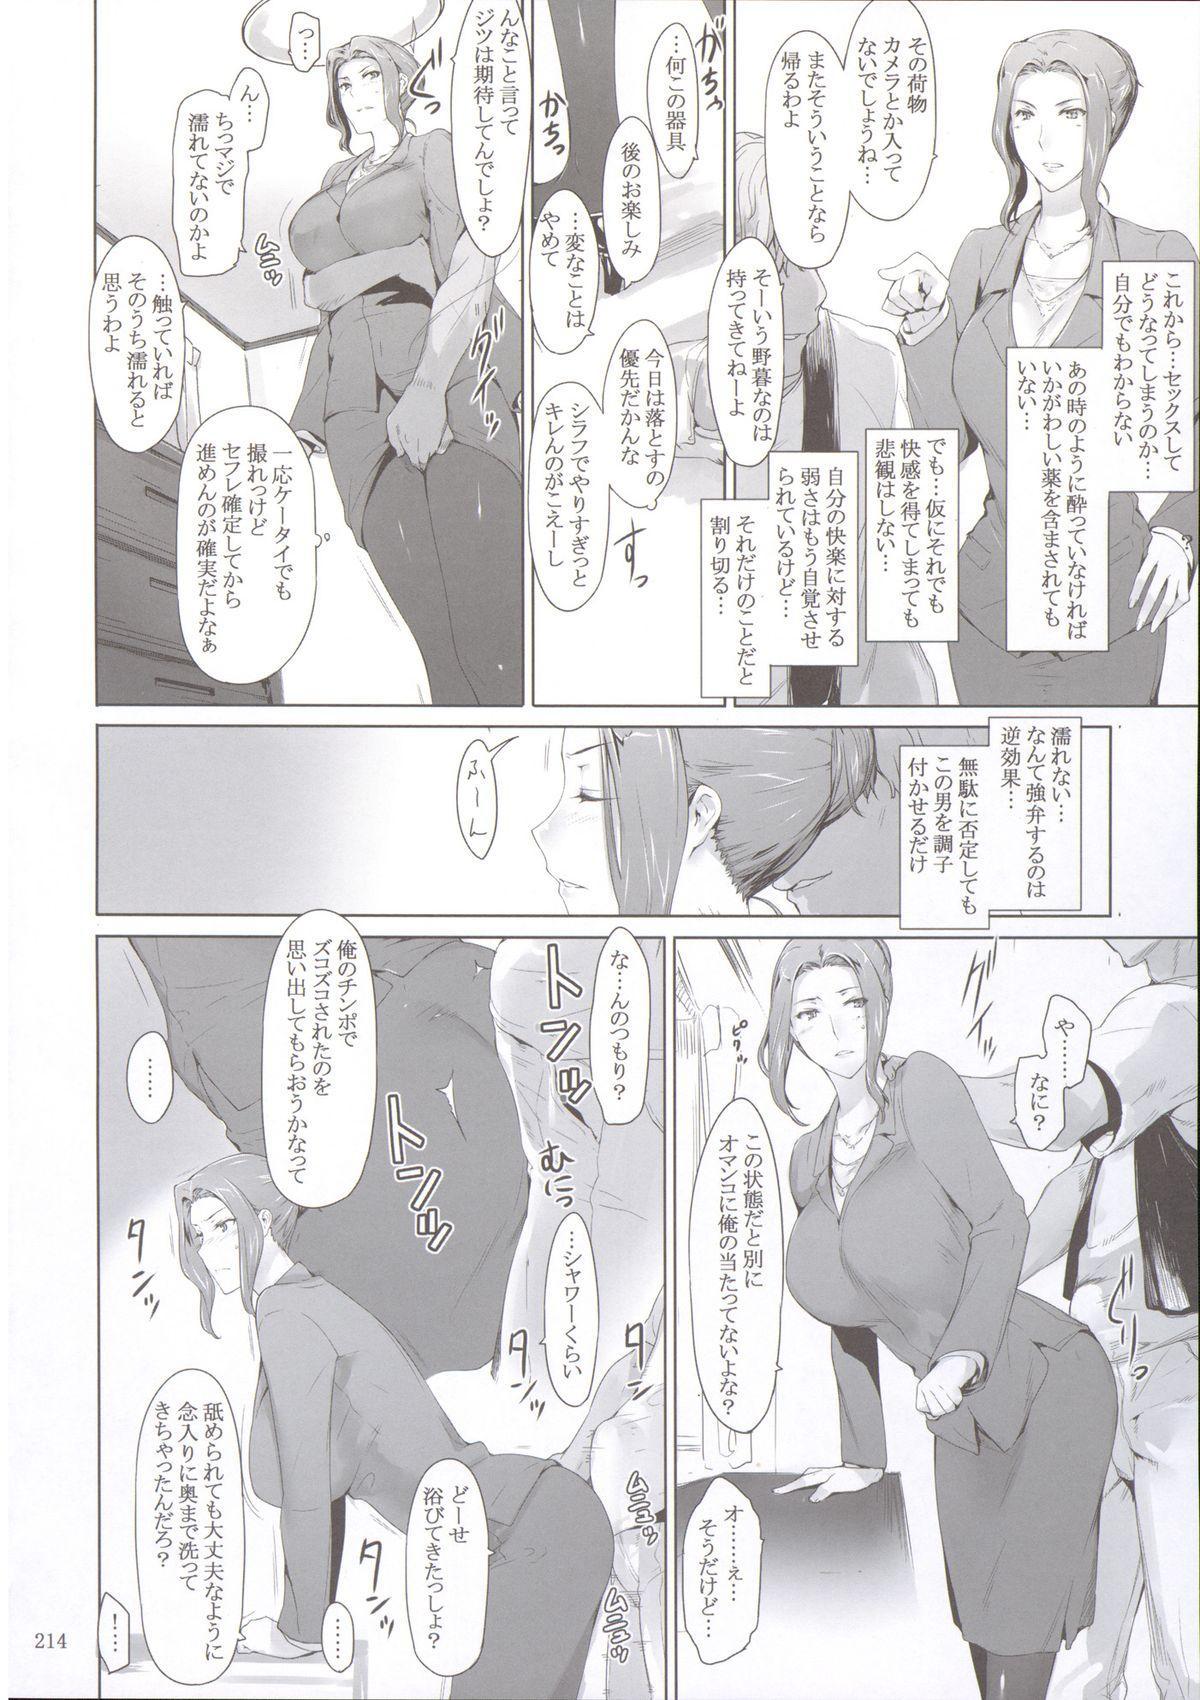 (C86) [MTSP (Jin)] Tachibana-san-chi no Dansei Jijou Matome Ban [Incomplete] 12